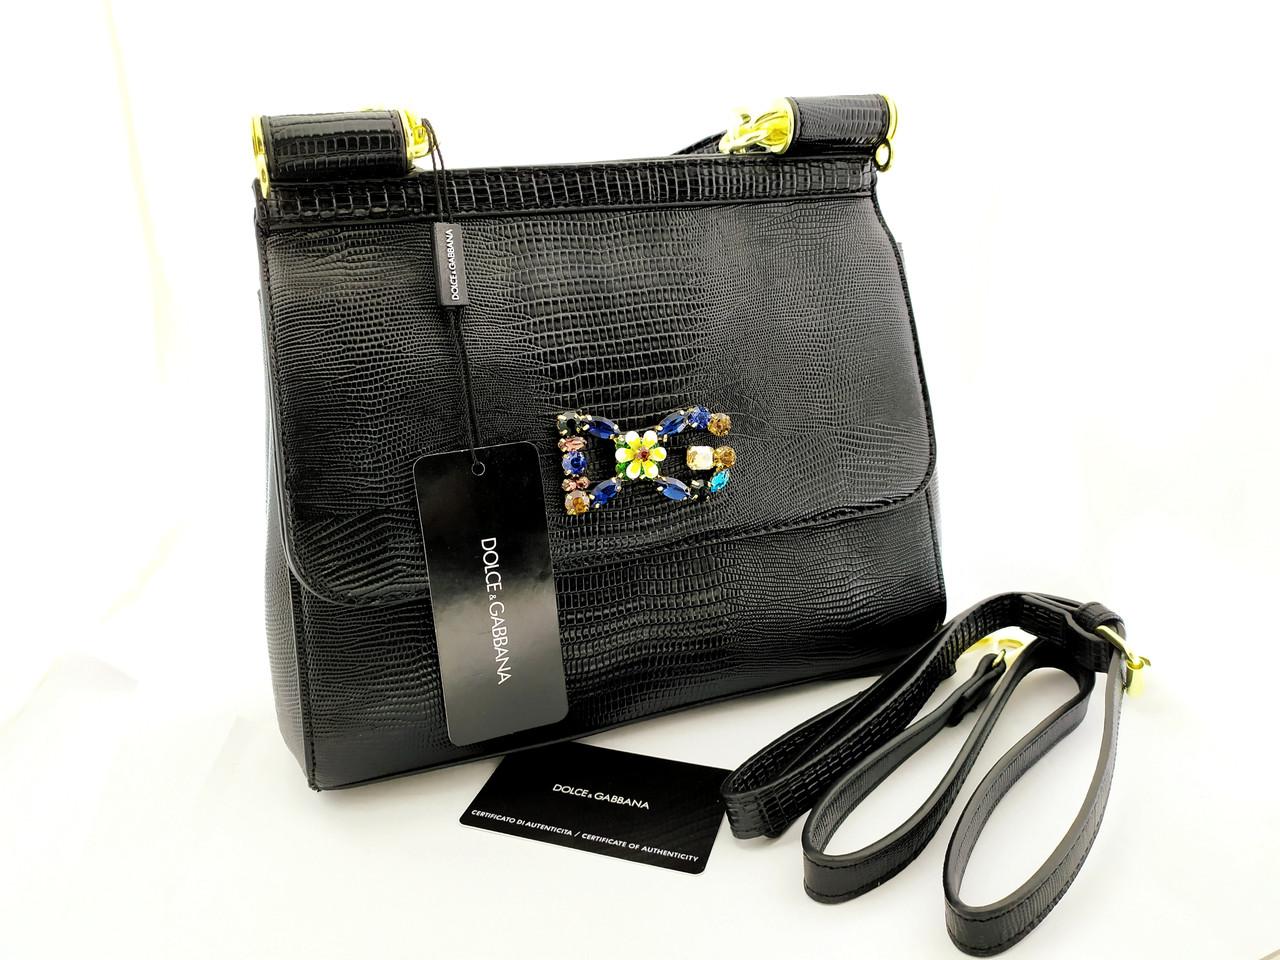 Шикарная брендовая сумка  Dolce & Gabbana, натуральная кожа